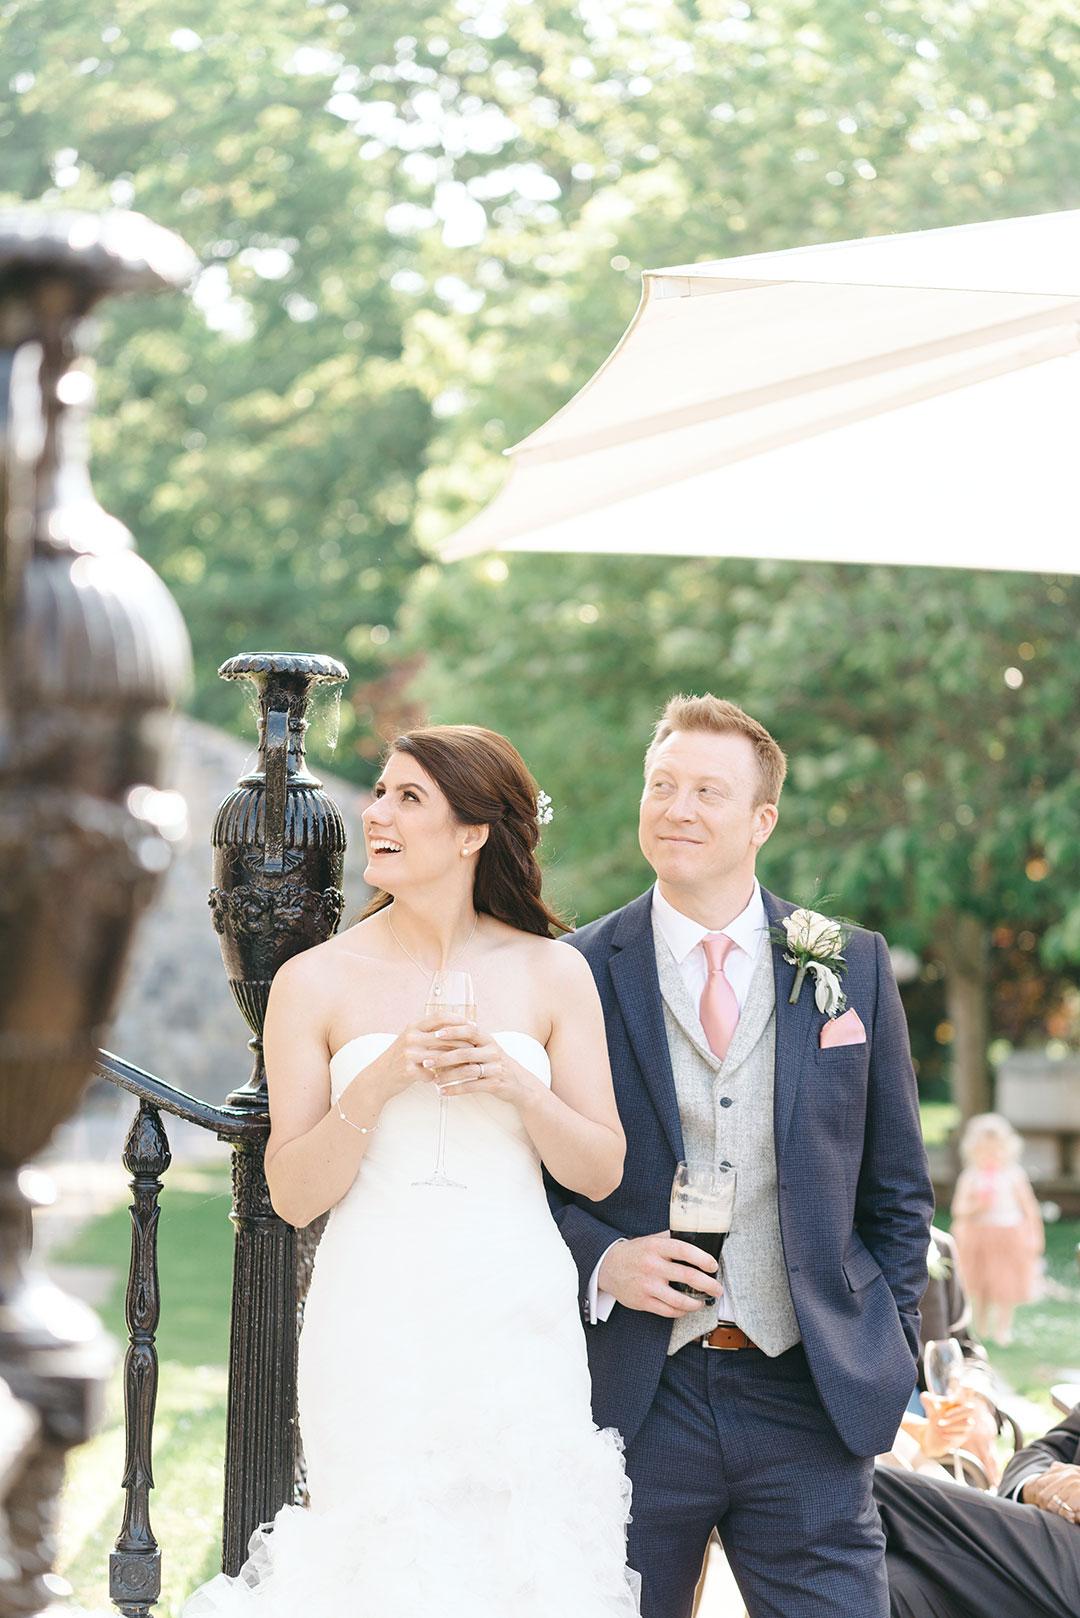 bellinter-house-wedding-photographer-0122_0122.jpg